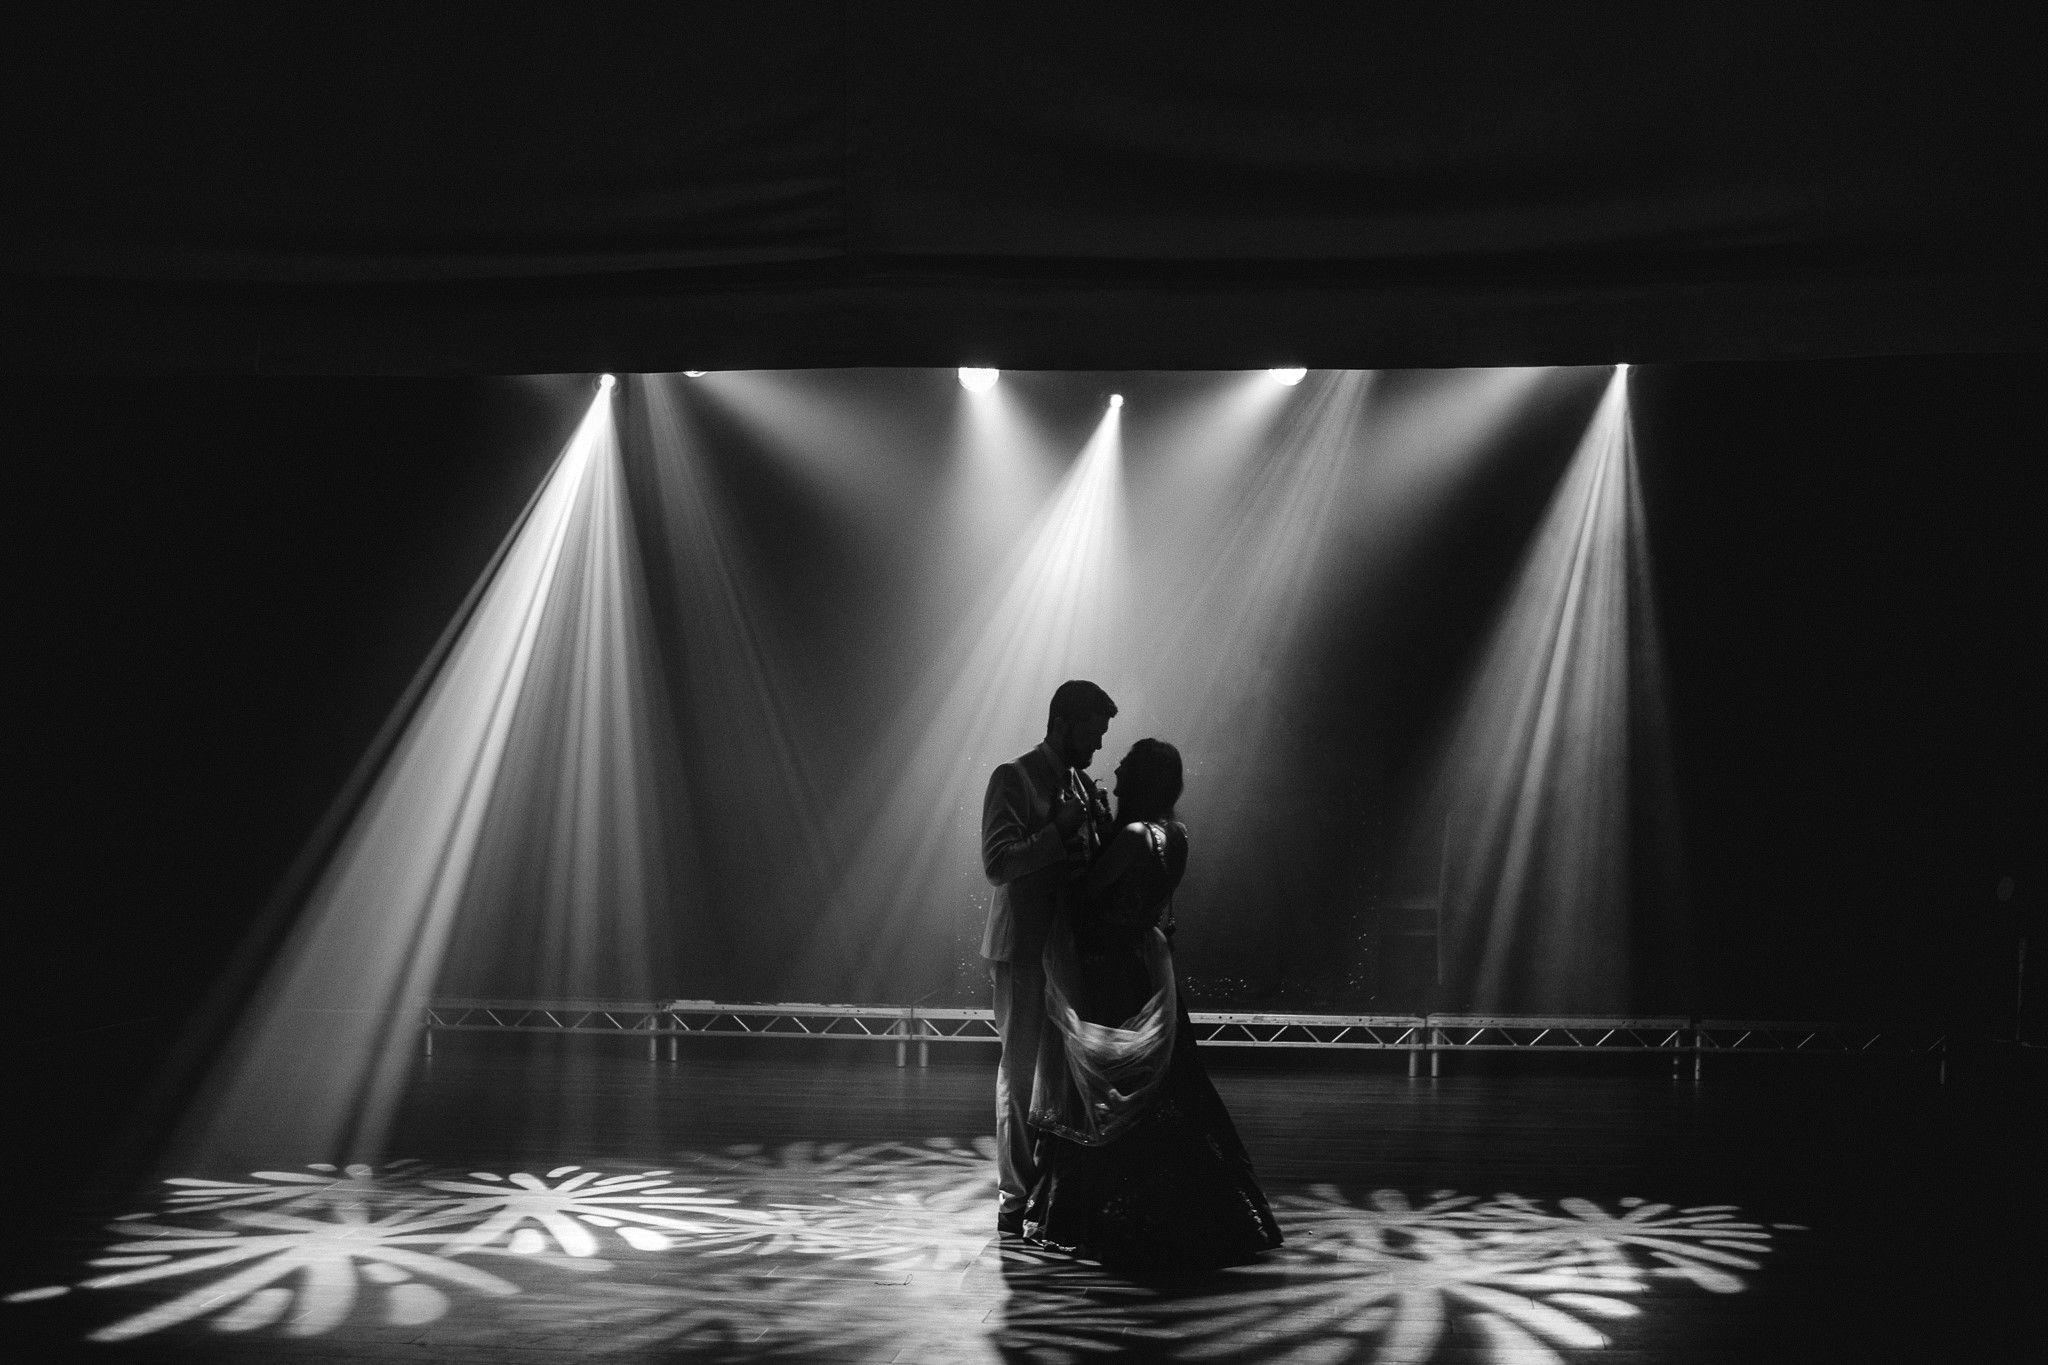 west-yorkshire-documentary-wedding-photographer-1-compressor.jpg